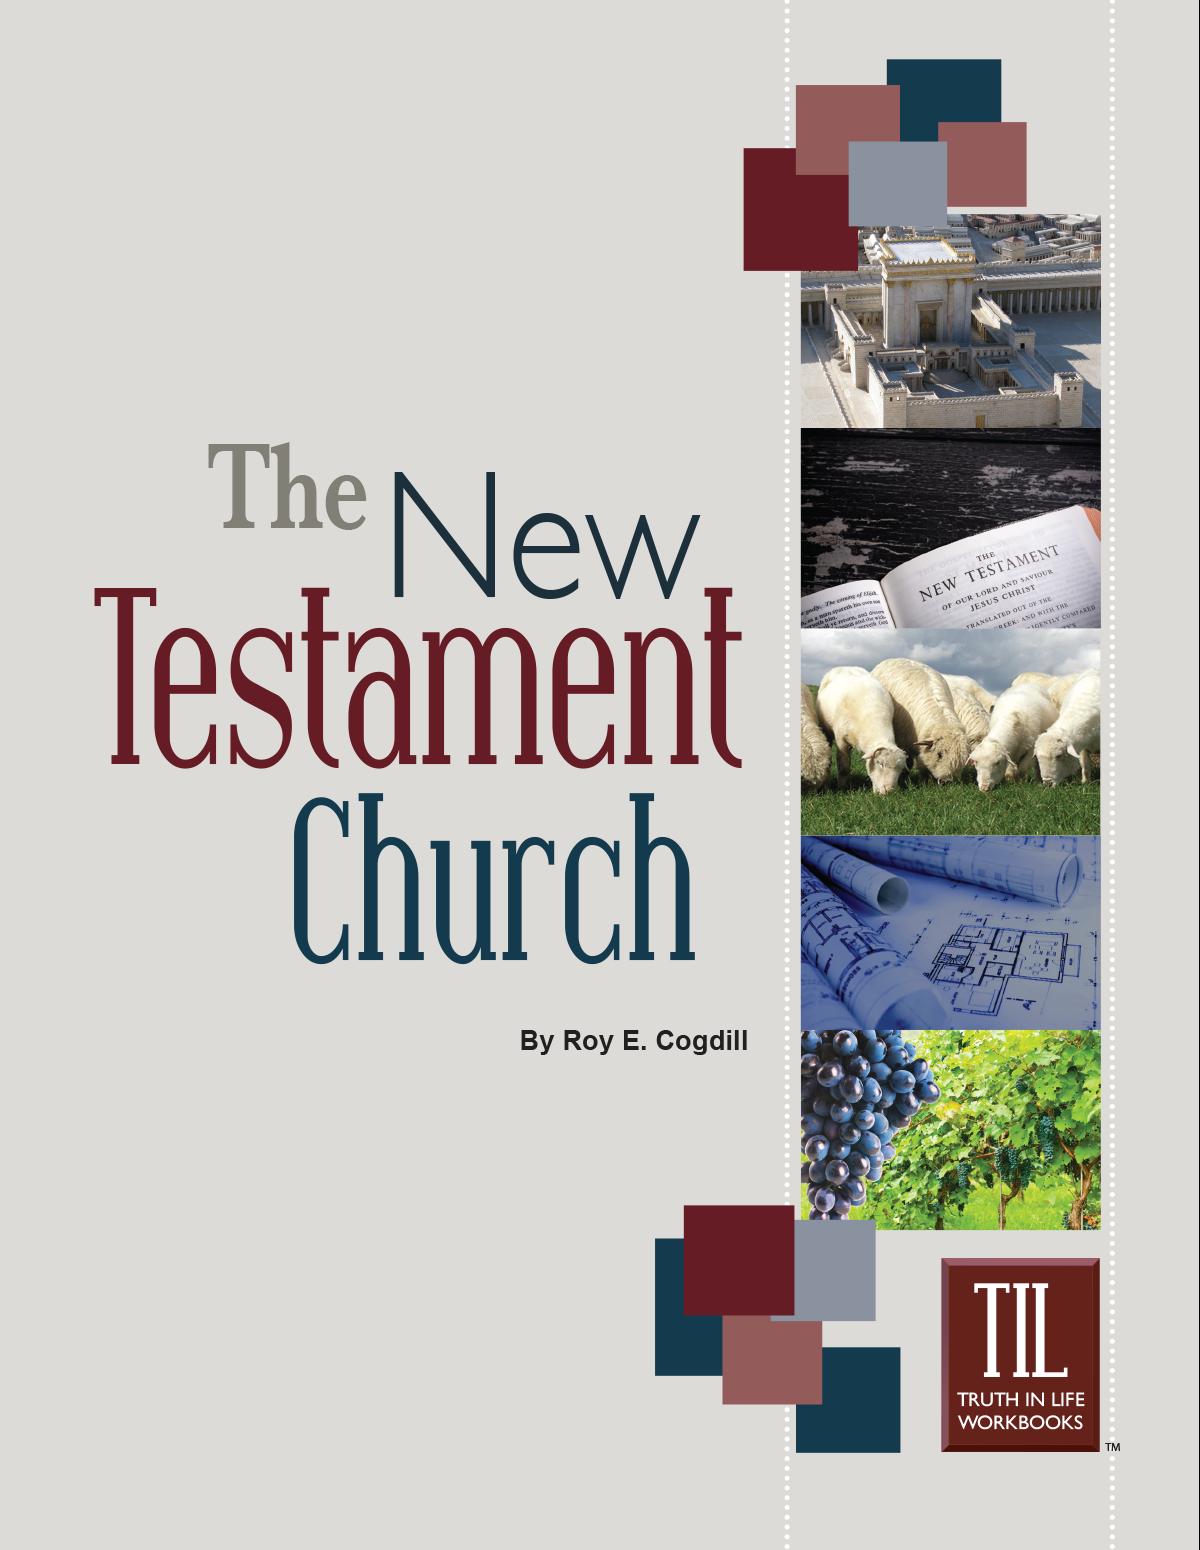 Workbooks christian workbooks for women : TIL The New Testament Church - CEI Bookstore / Truth Publications